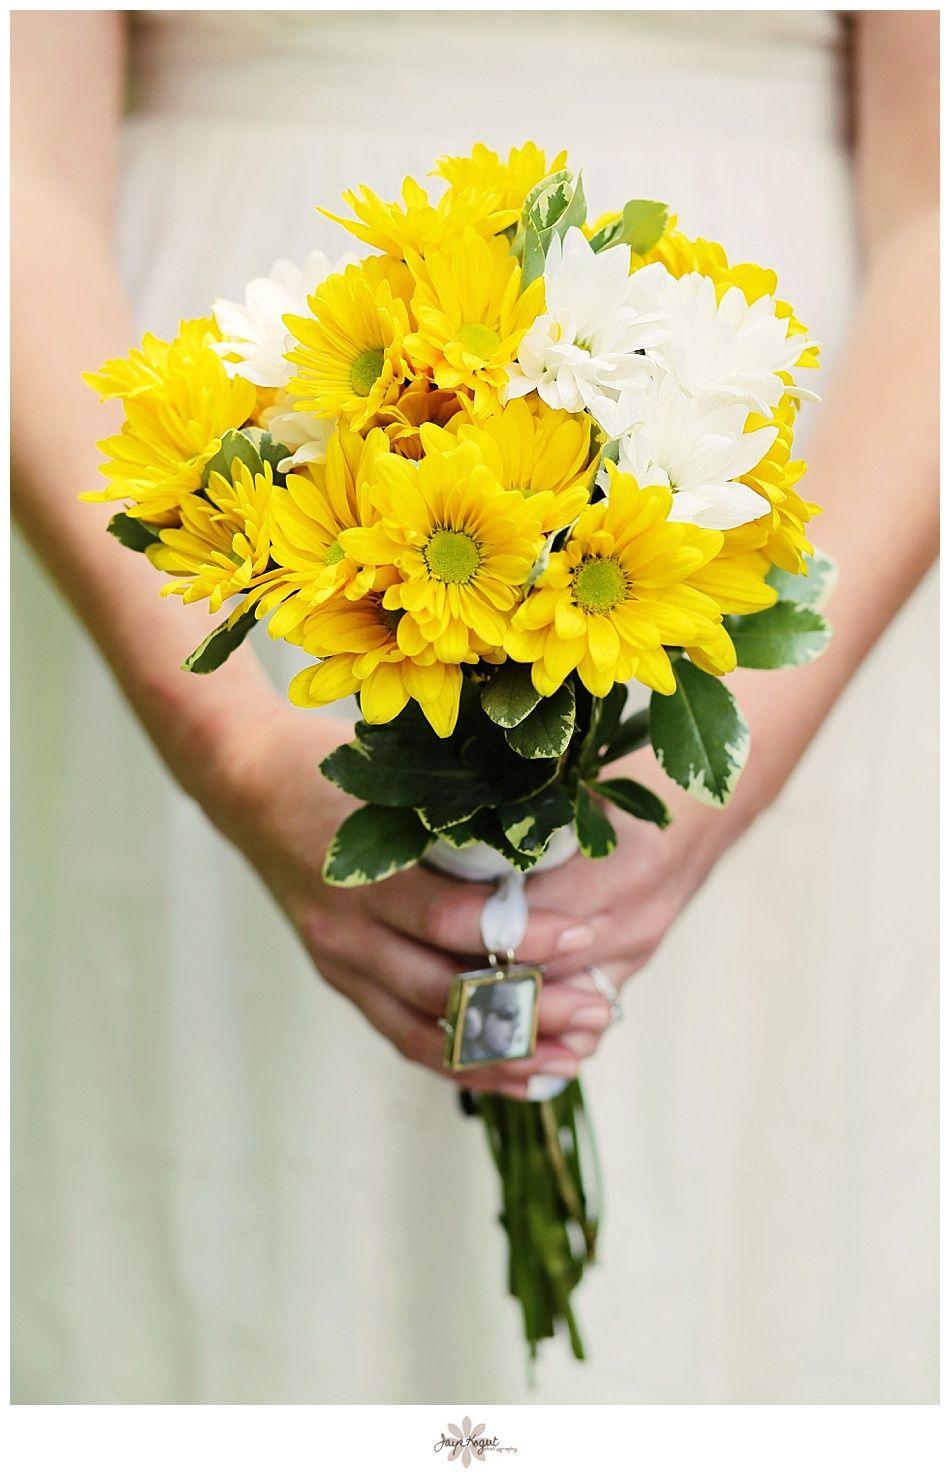 Yellow wedding bouquet yellow wedding flowers daisy wedding yellow wedding bouquet yellow wedding flowers daisy wedding bouquet nj wedding photographer izmirmasajfo